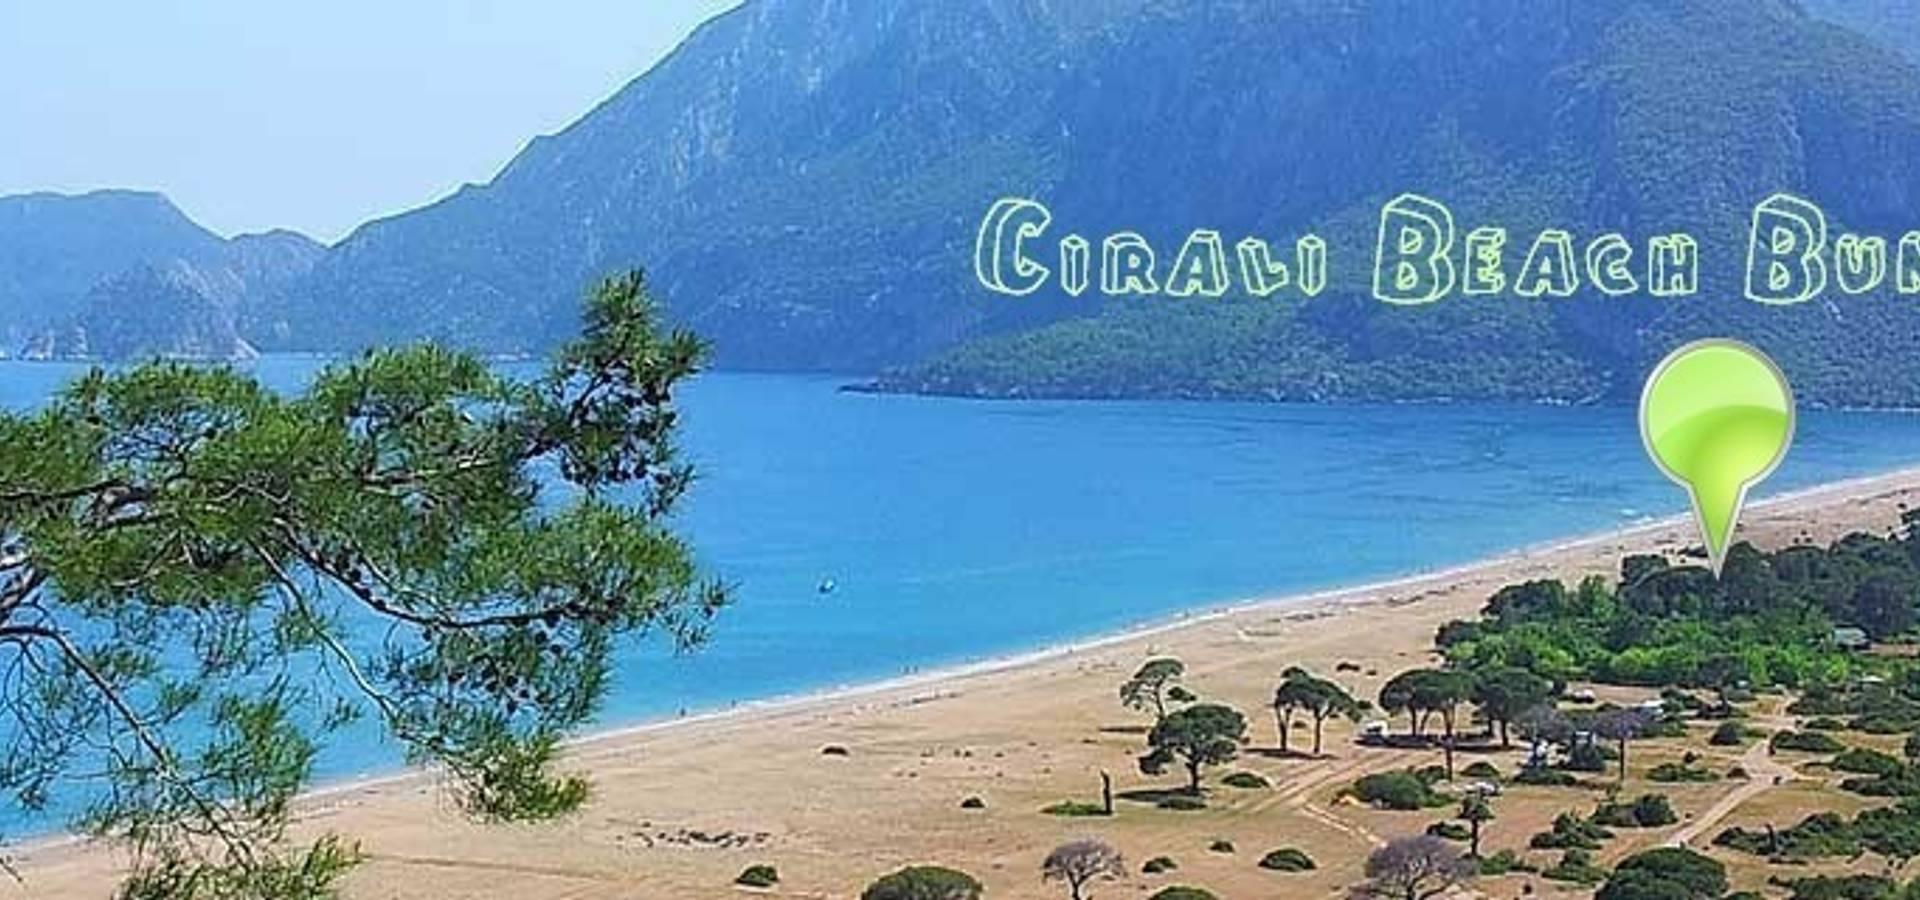 Cıralı Beach Bungalows